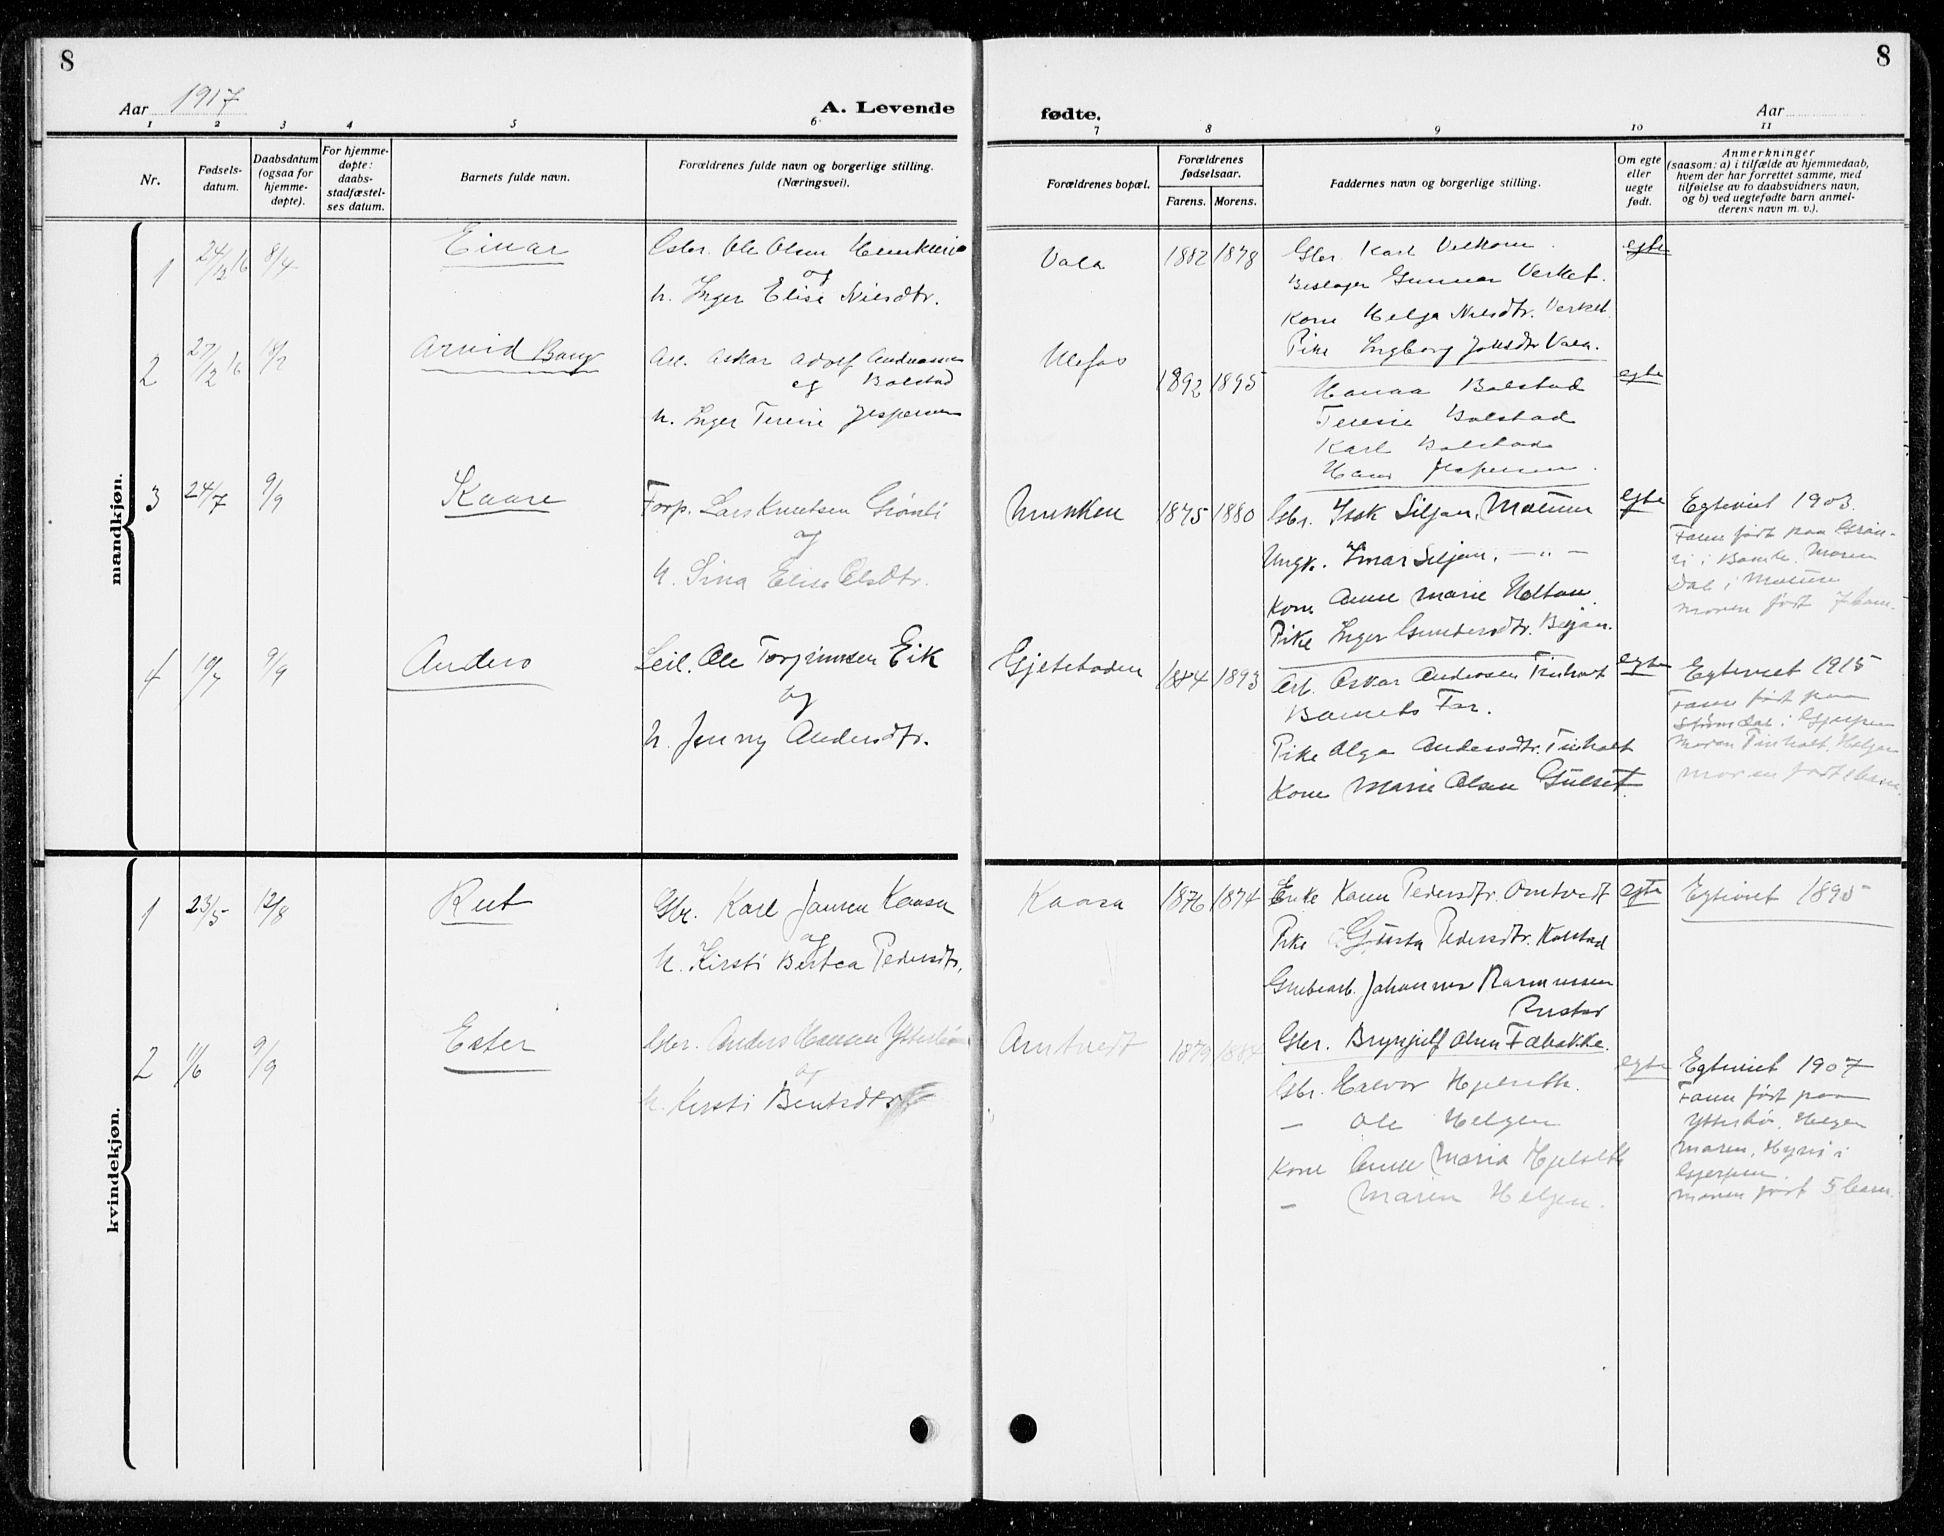 SAKO, Holla kirkebøker, G/Gb/L0003: Klokkerbok nr. II 3, 1914-1941, s. 8